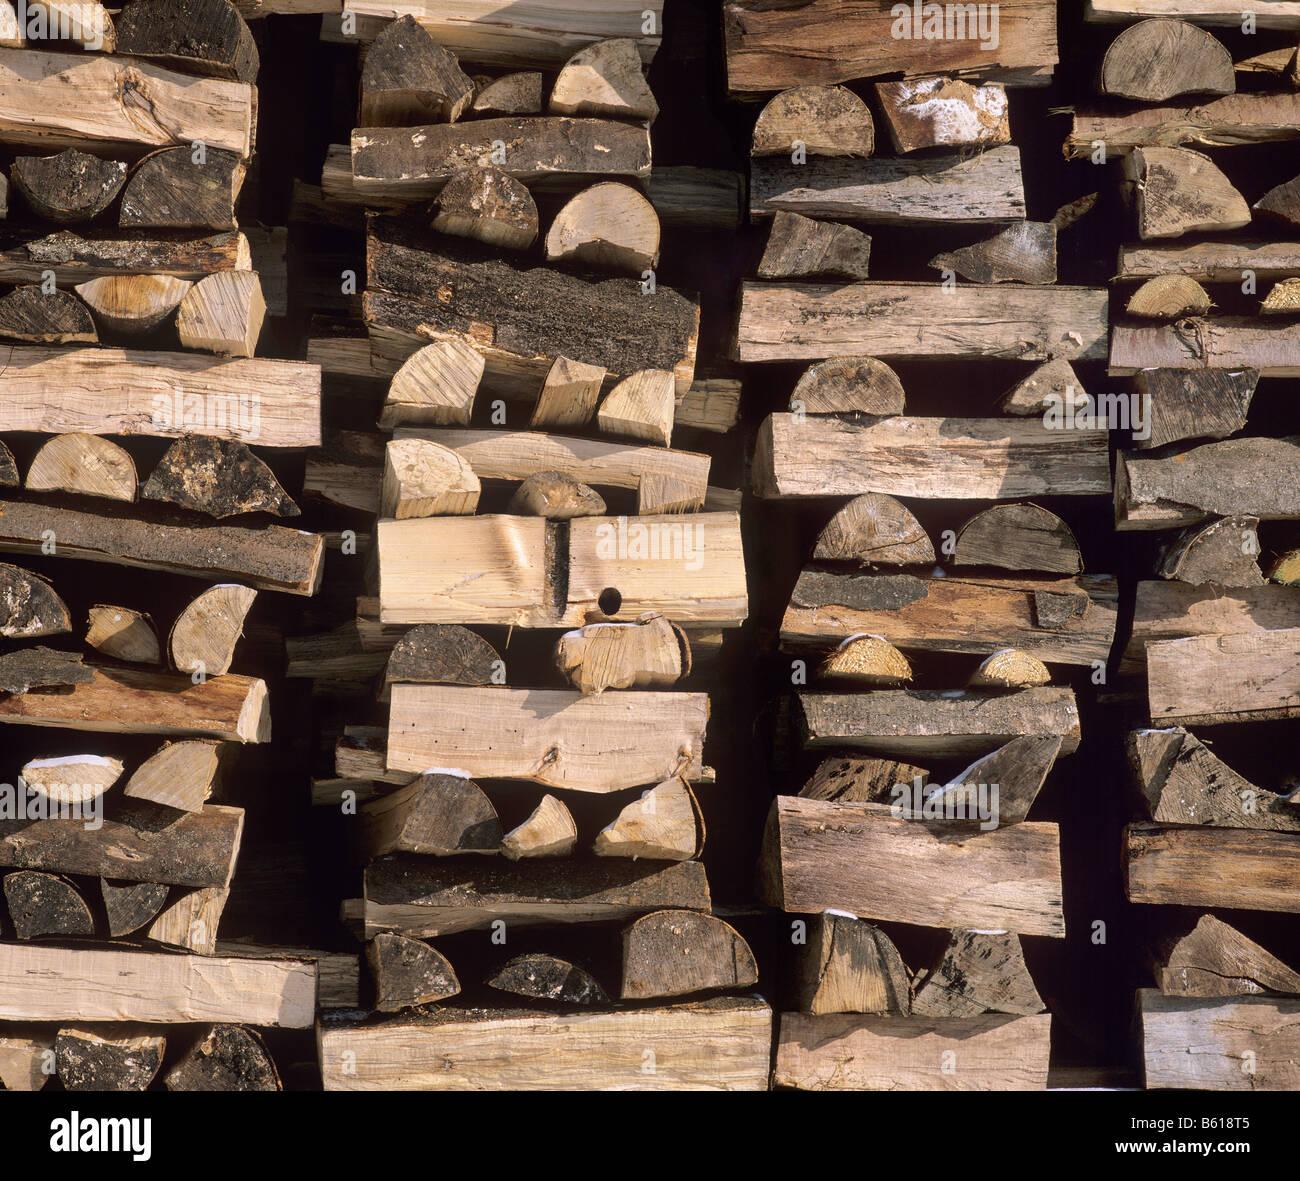 Stacked firewood, full frame - Stock Image